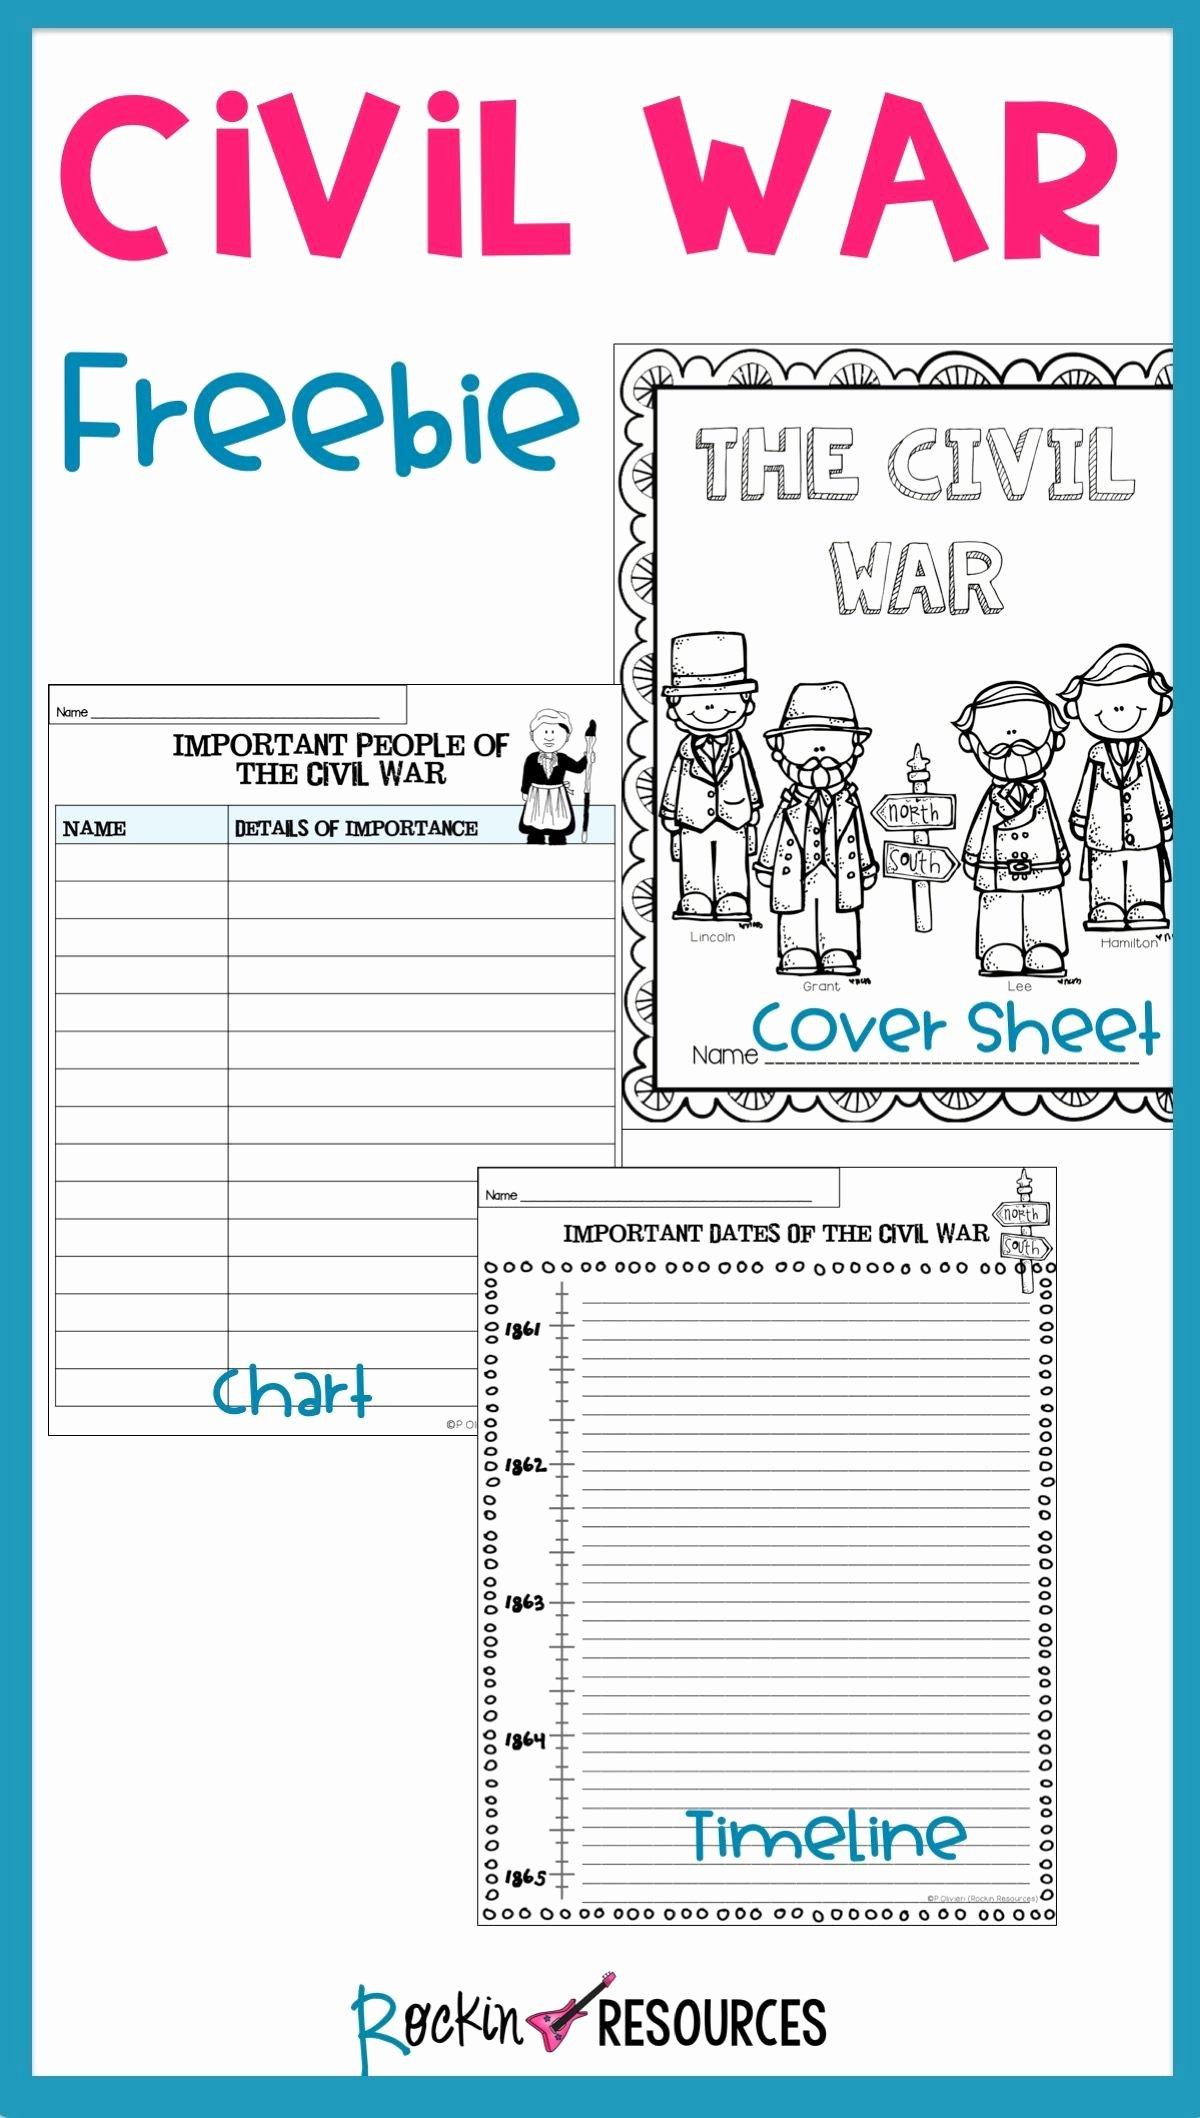 Civil War Worksheets 5th Grade Best Of Linear Causes the Civil War Worksheet